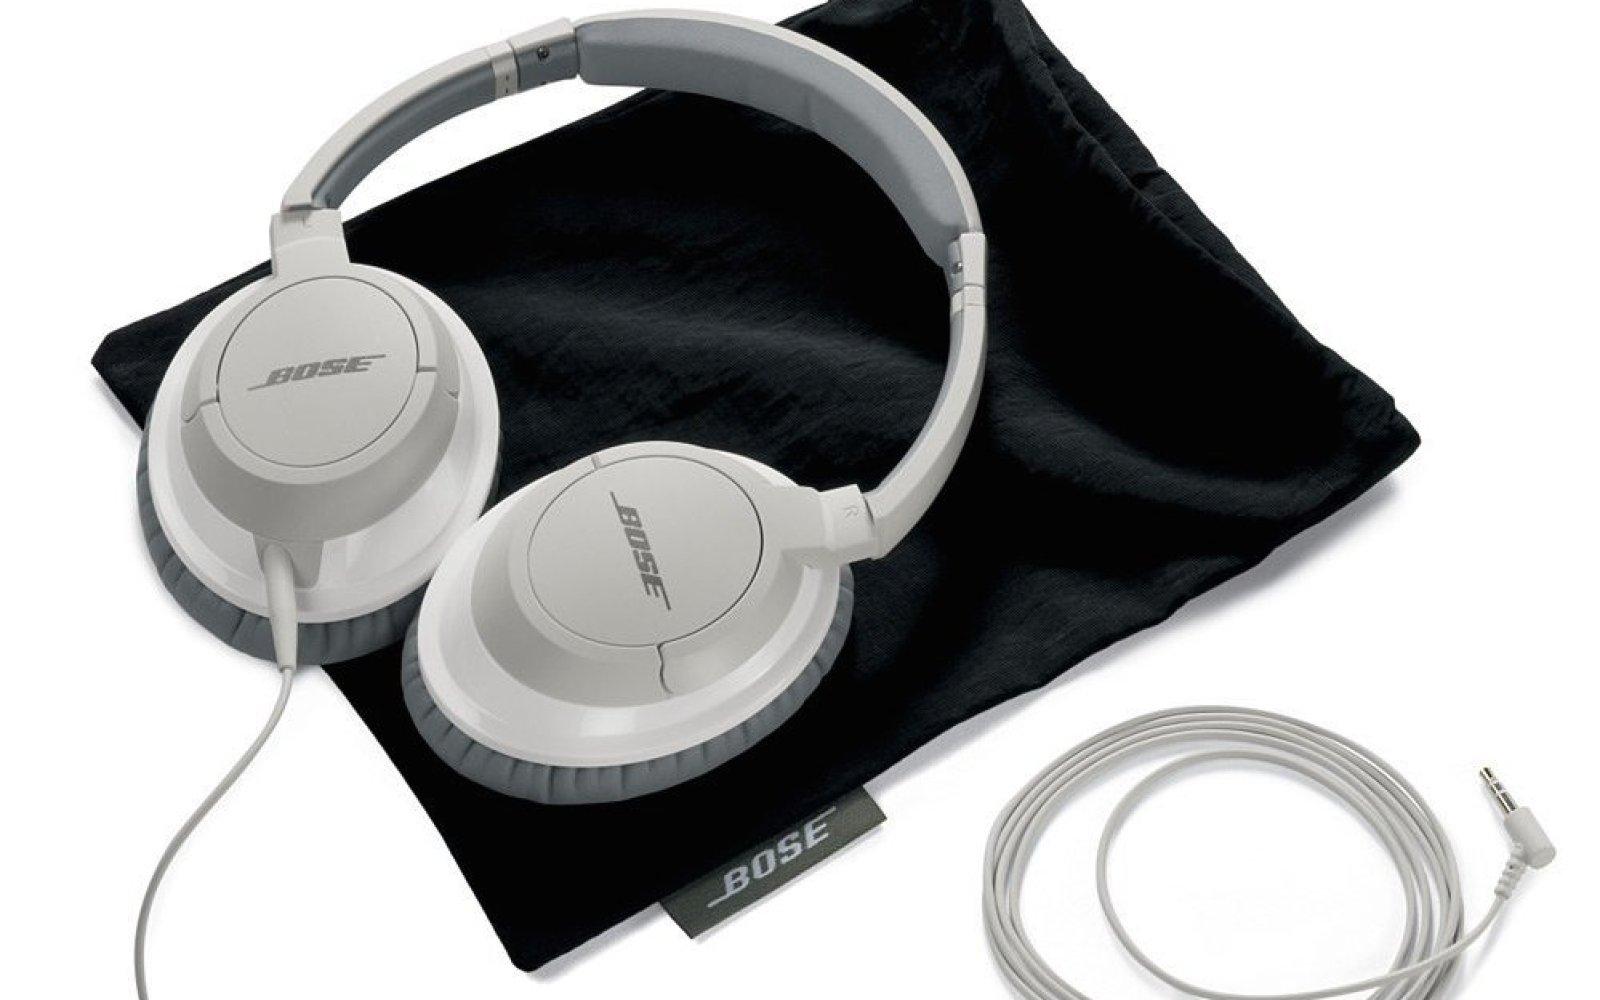 Bose AE2 fold-flat over-ear headphones $70 shipped (Reg. $150)